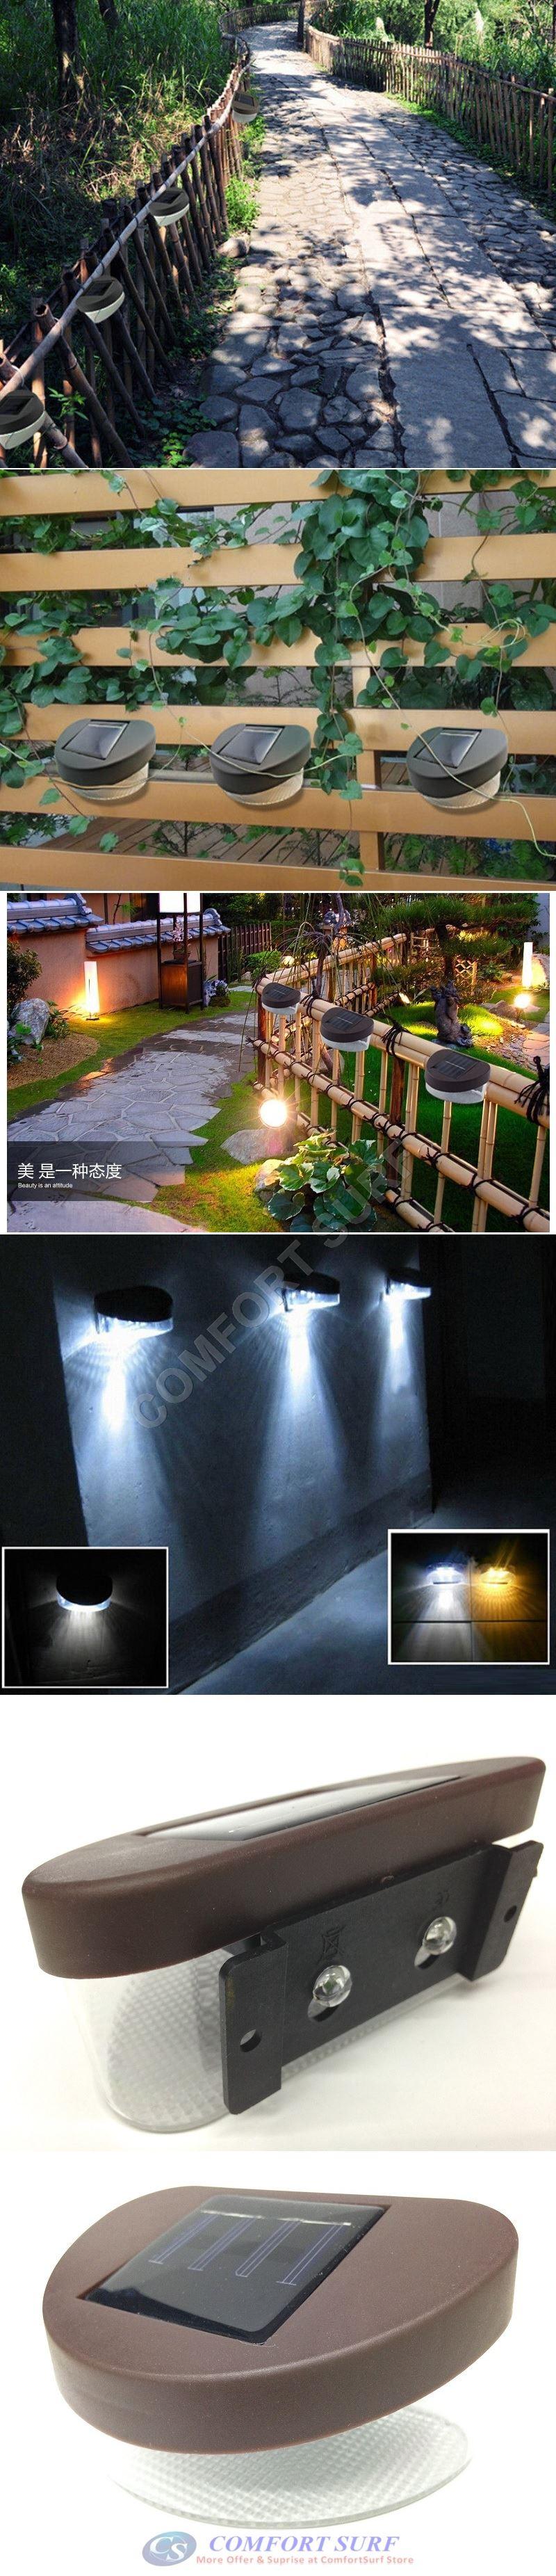 Solar Powered LED Yard Lawn Light Outdoor Landscape Garden Path Gutter Fence Light Lamp